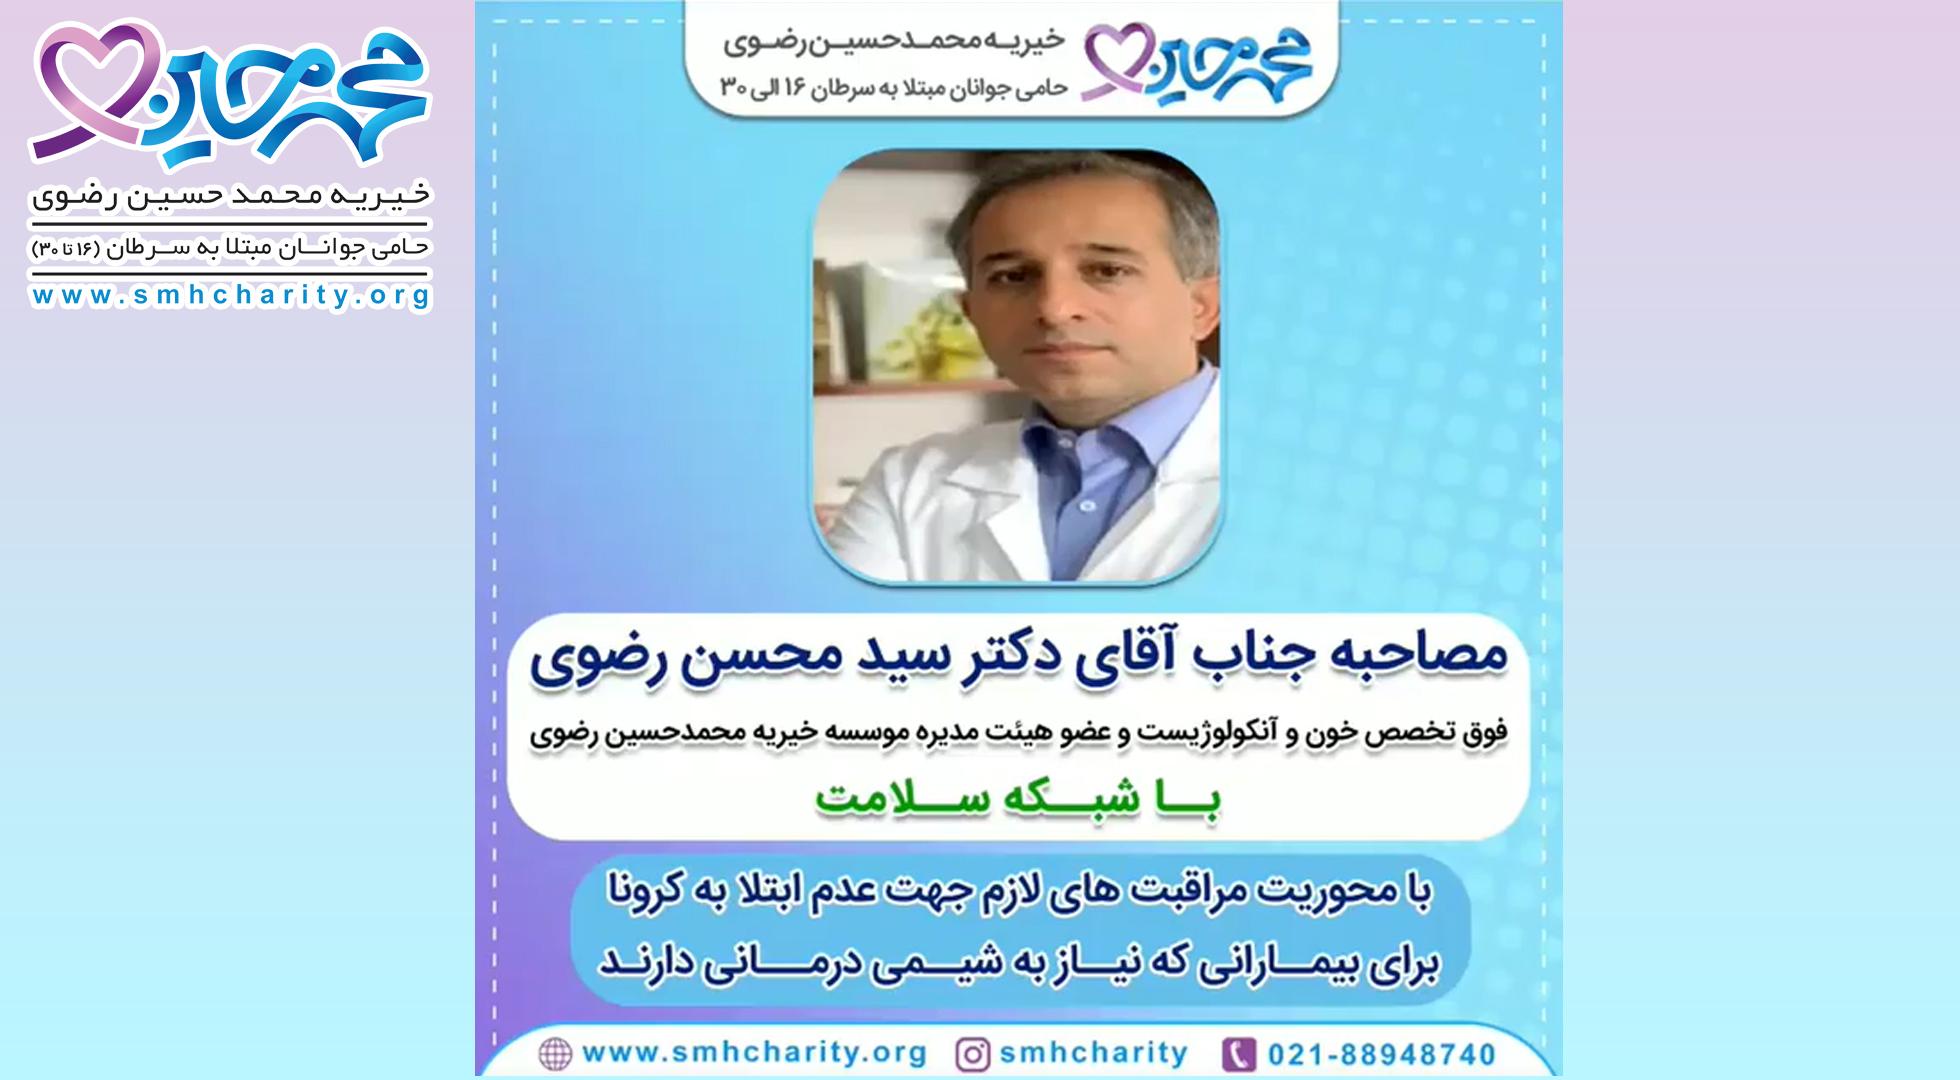 گفتگوی تلفنی دکتر رضوی با شبکه سلامت